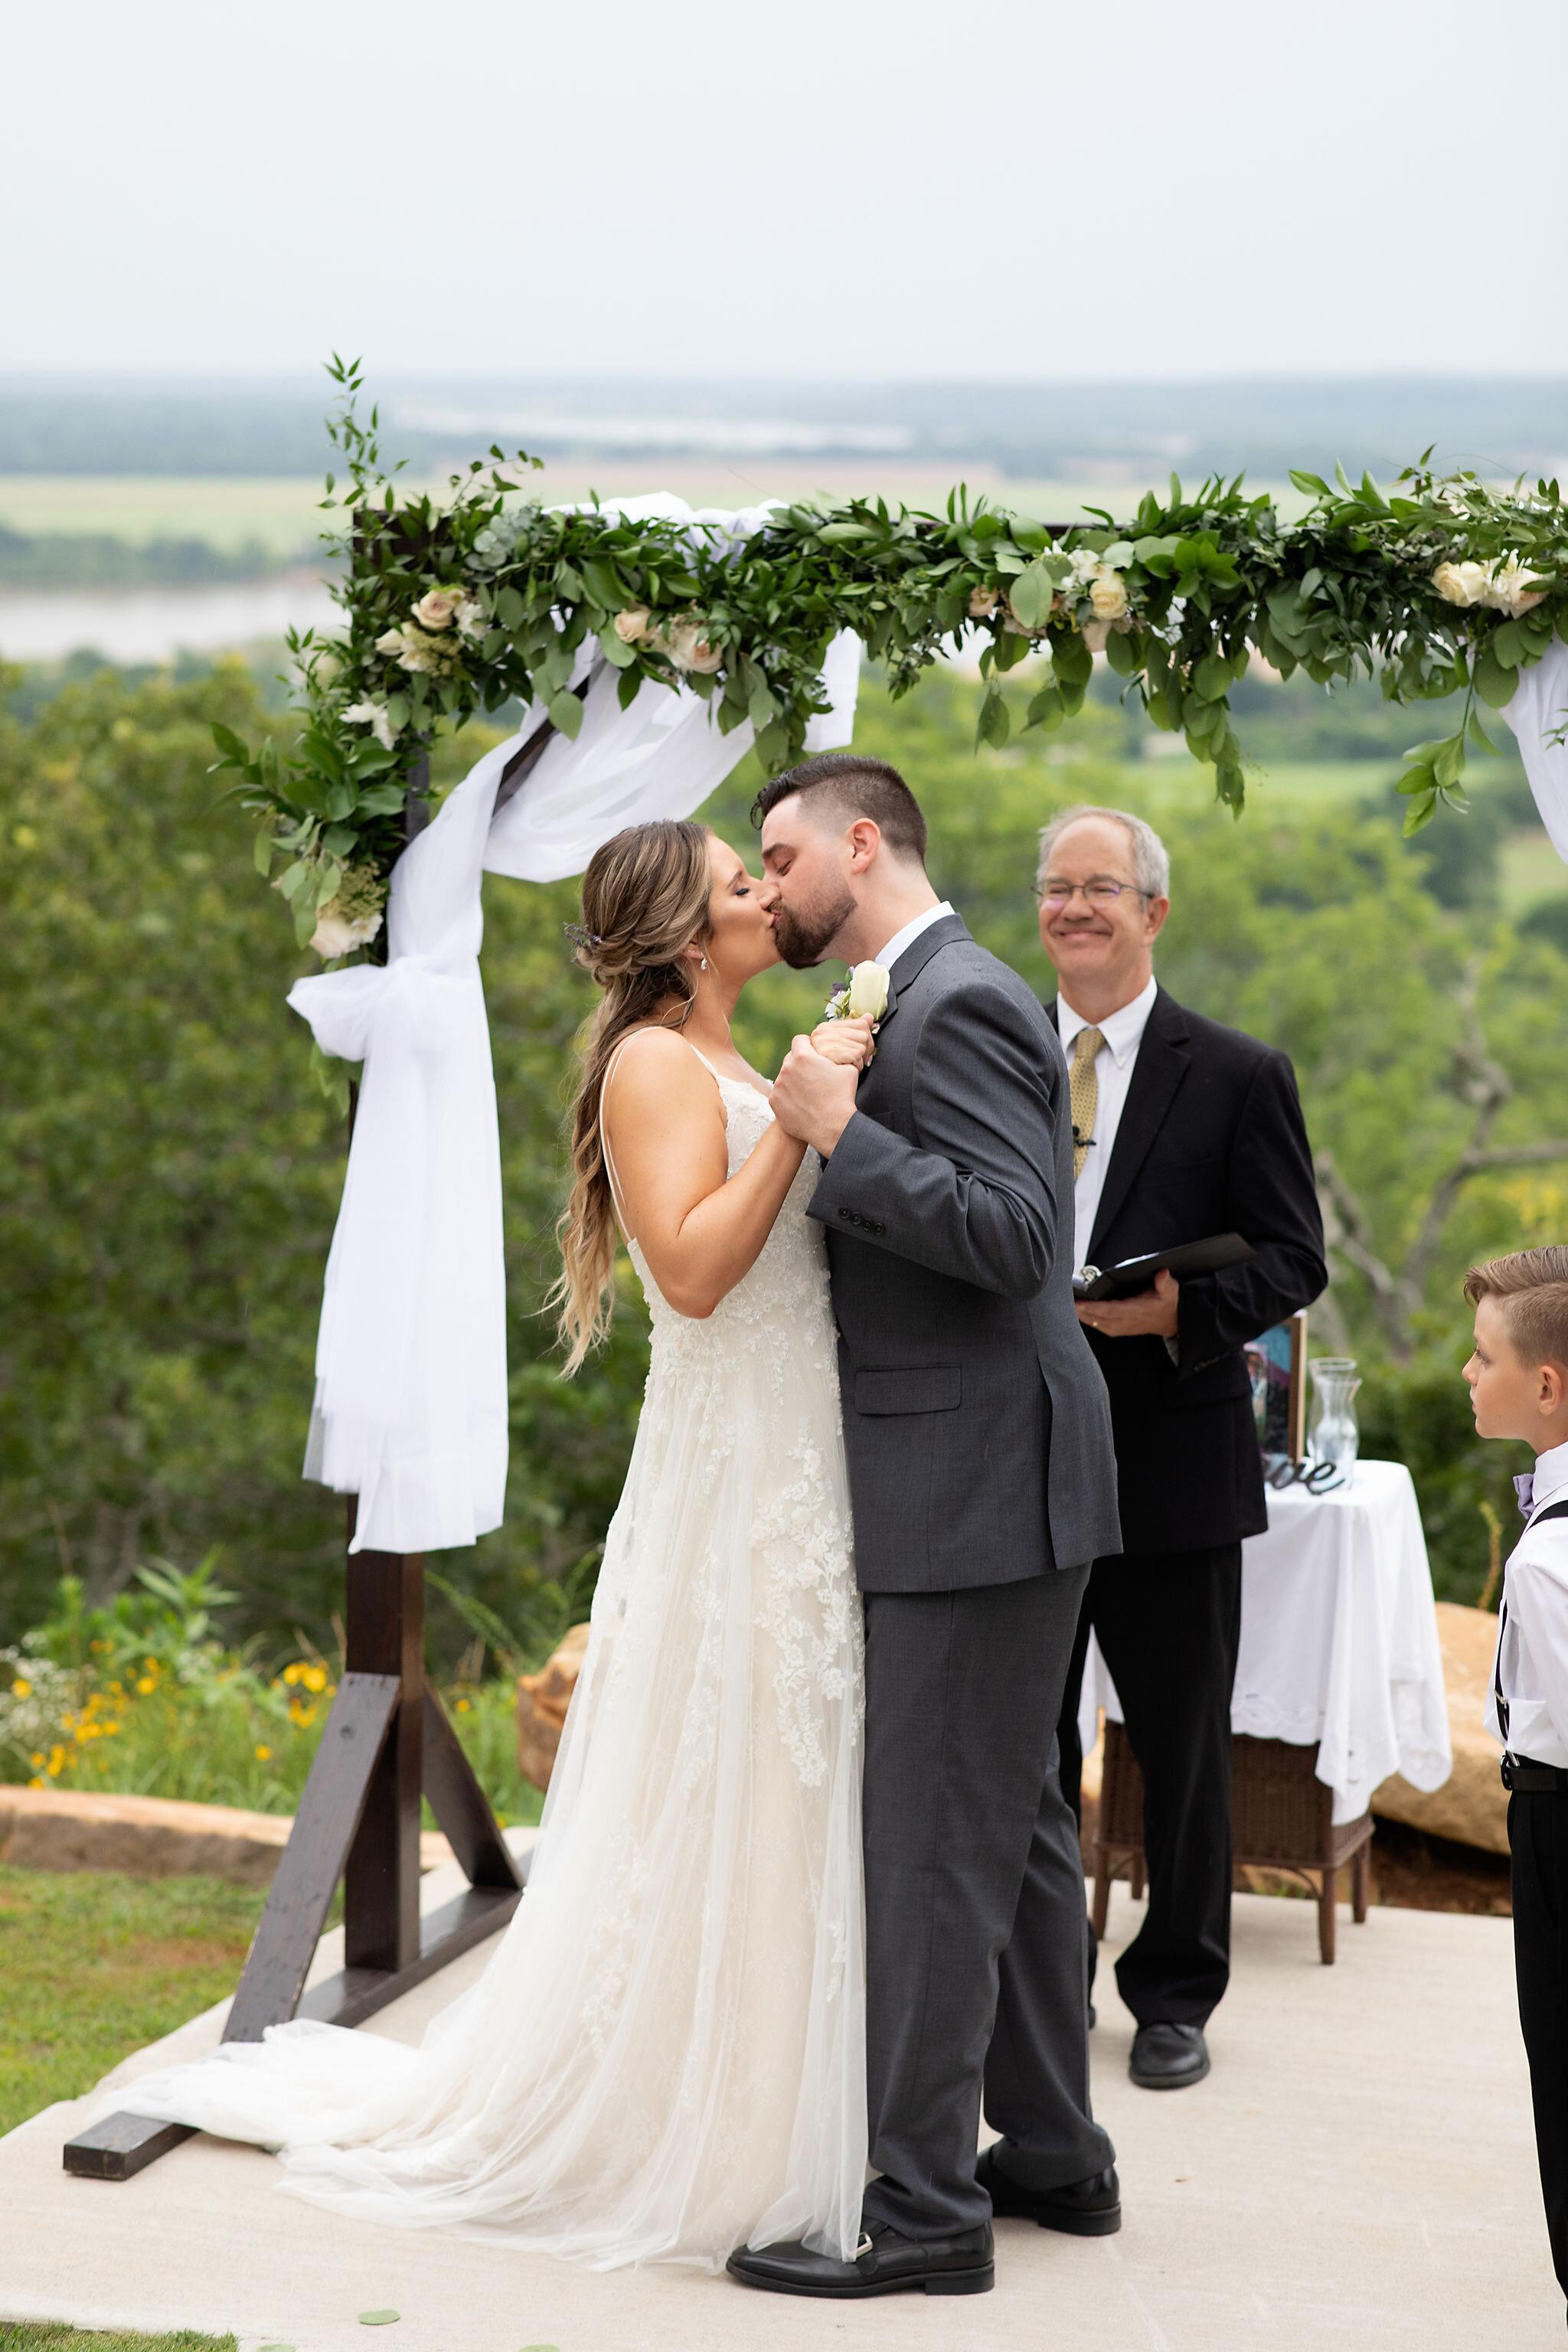 Oklahoma Summer Wedding Venue Dream Point Ranch 33.jpg